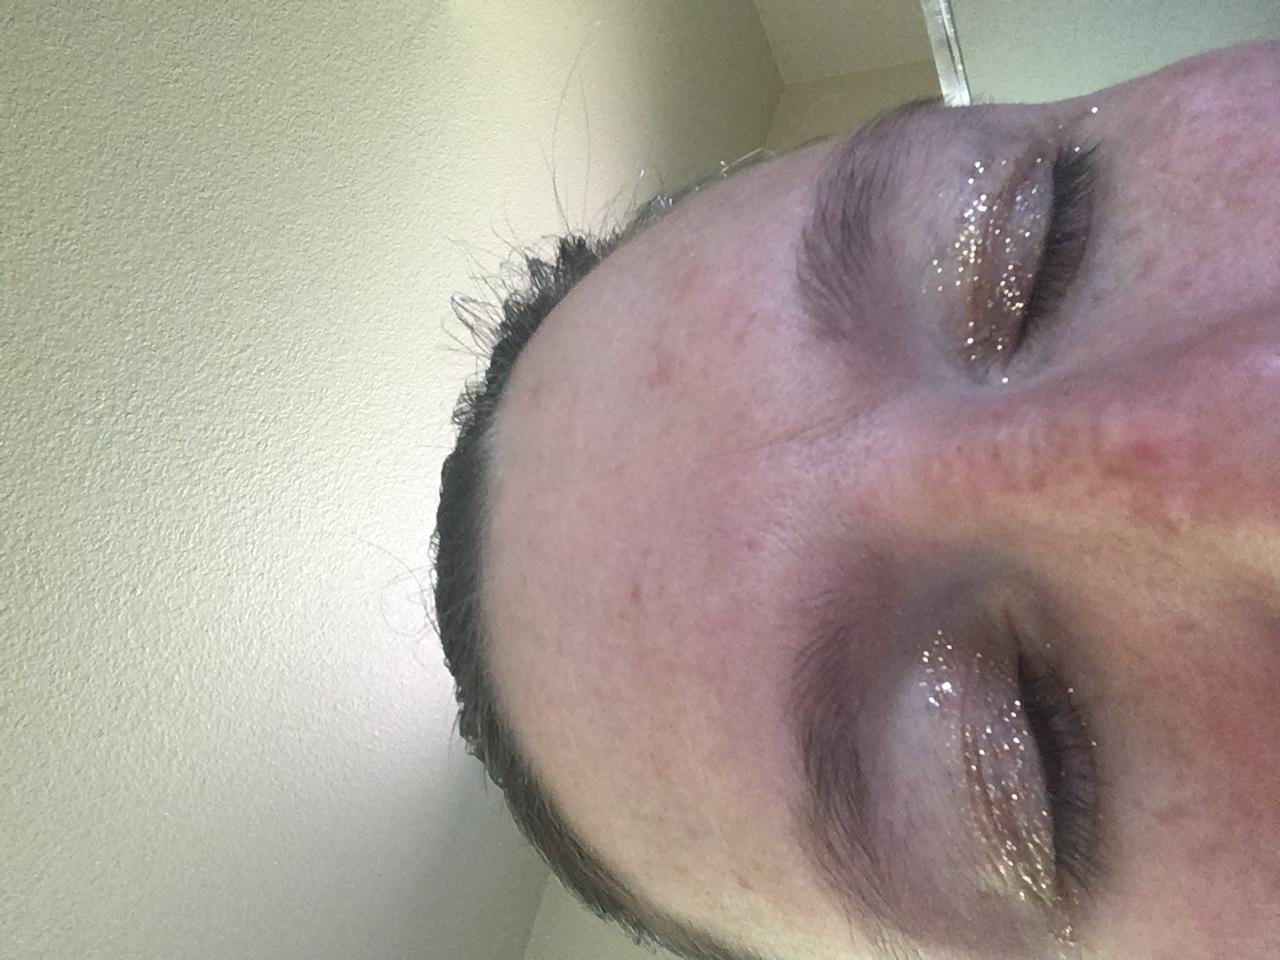 Oh the glitter